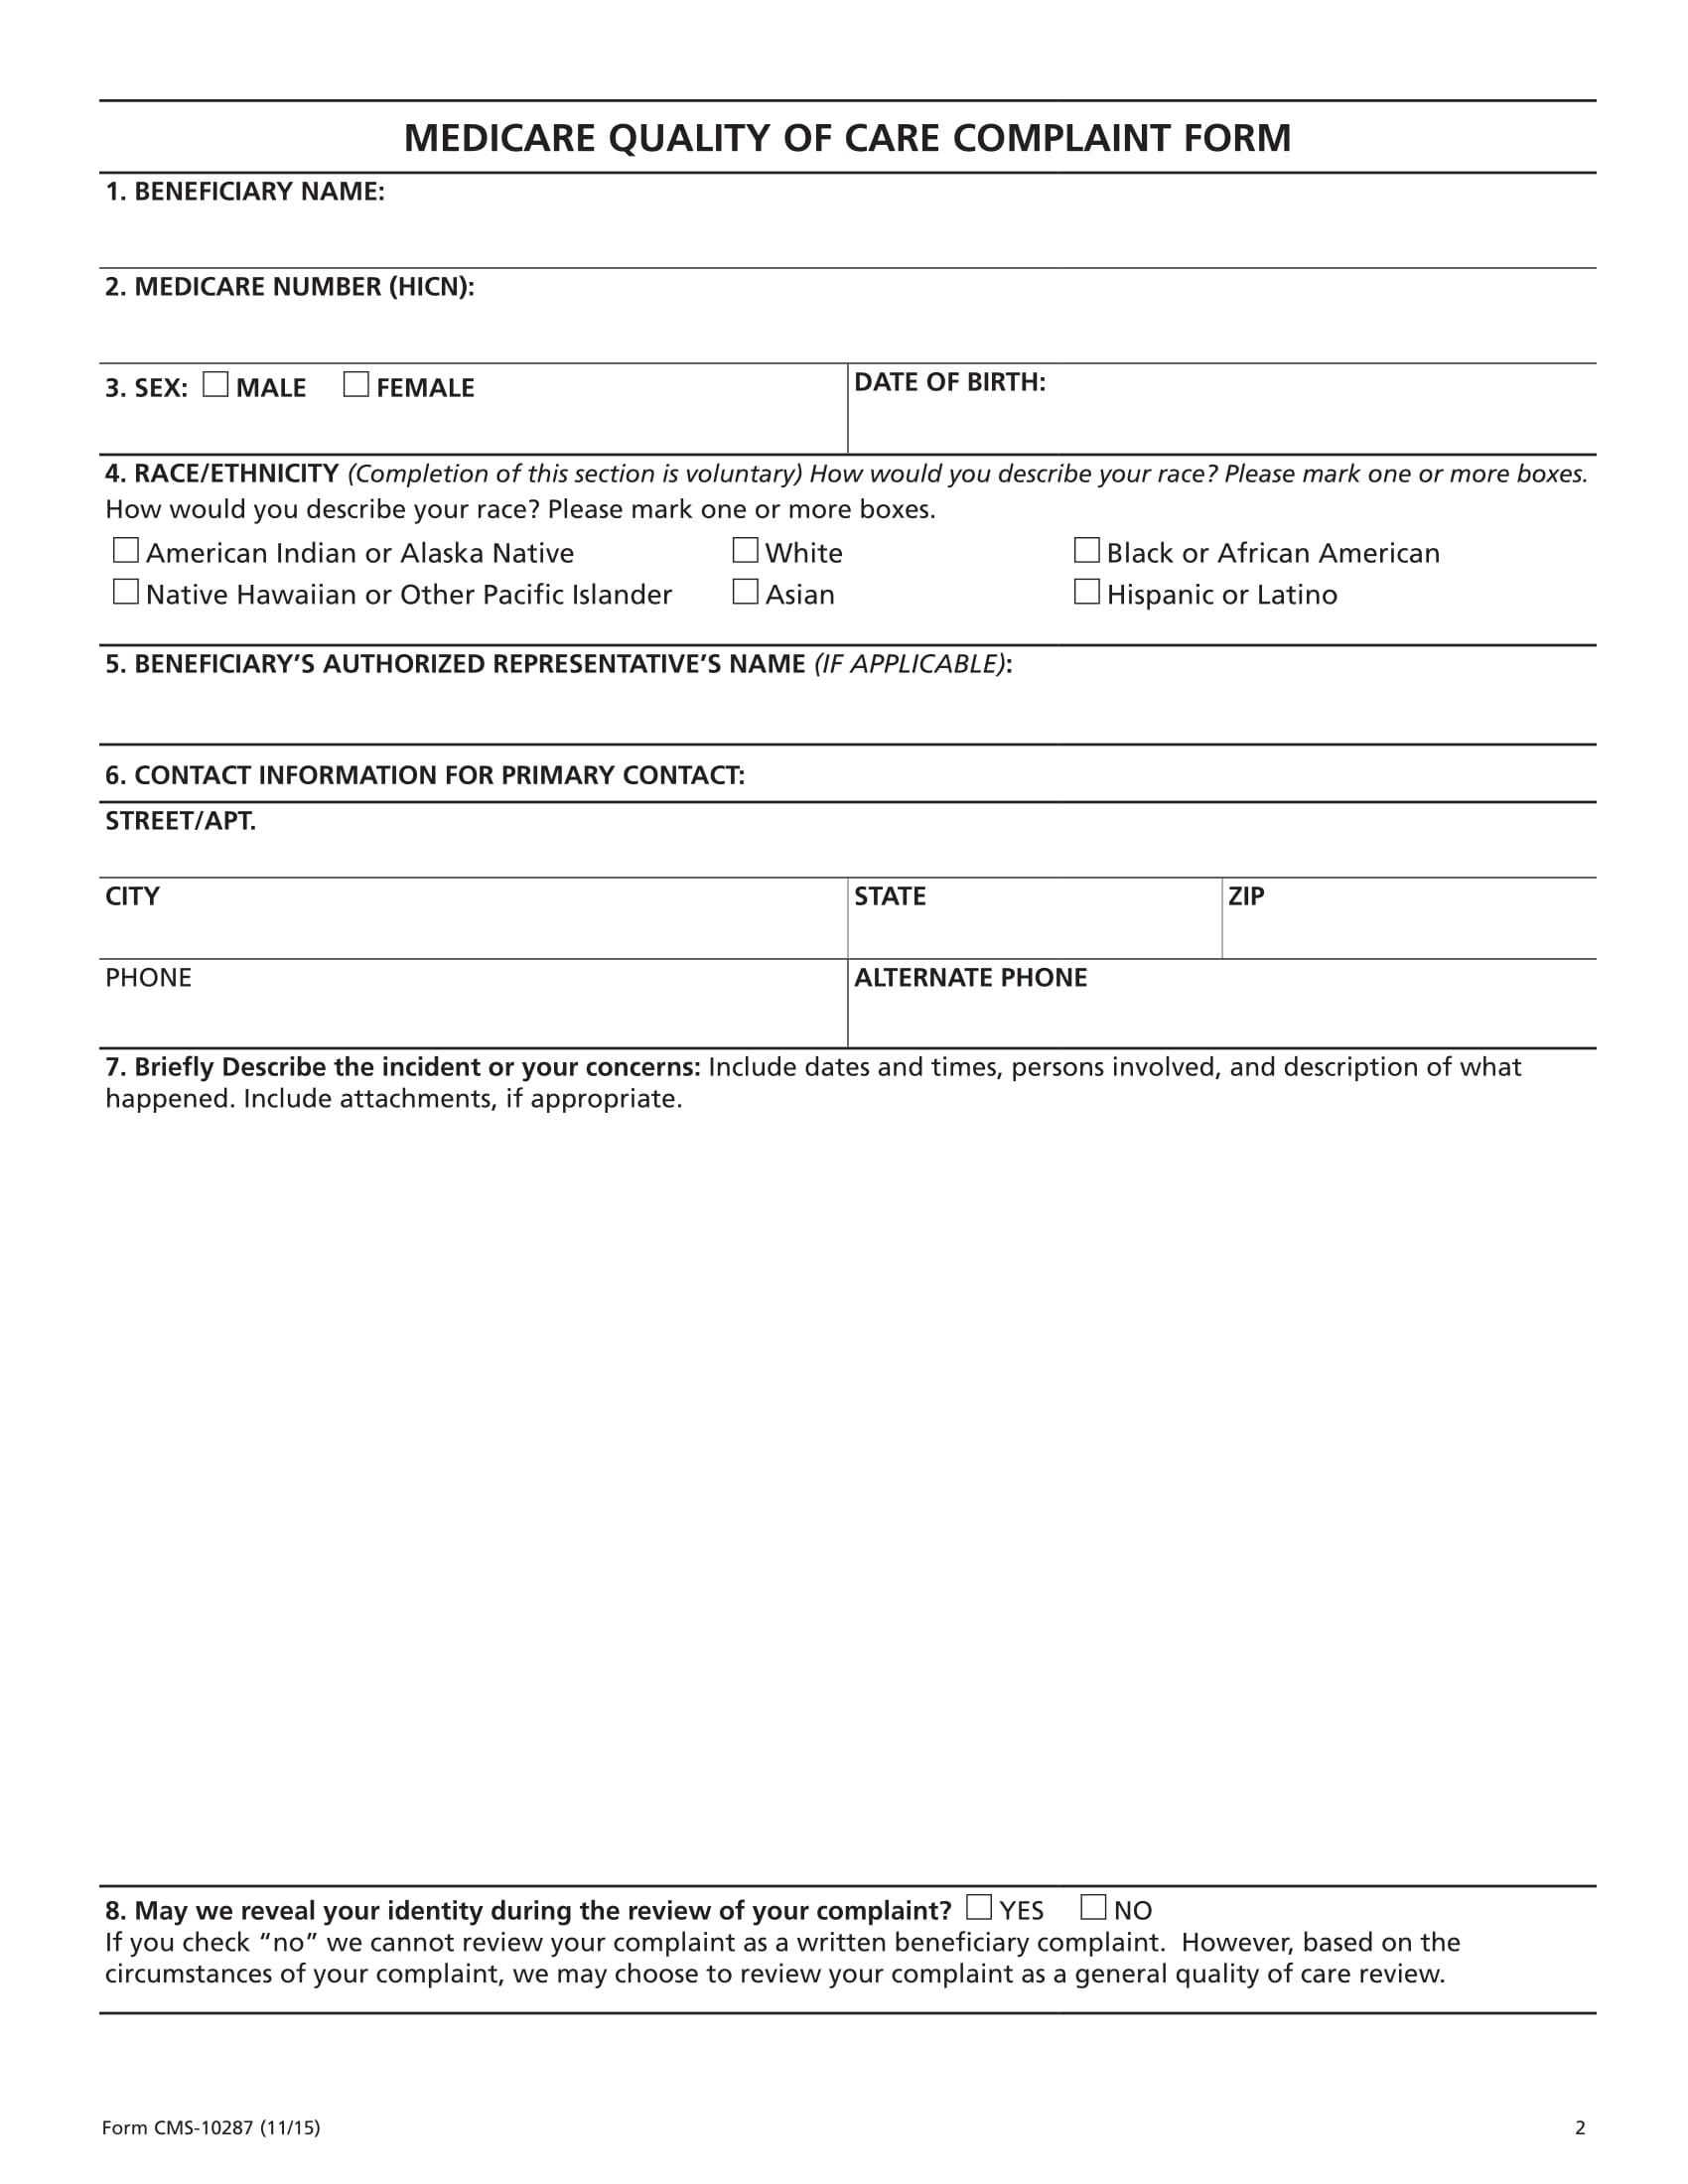 medicare complaint form 2